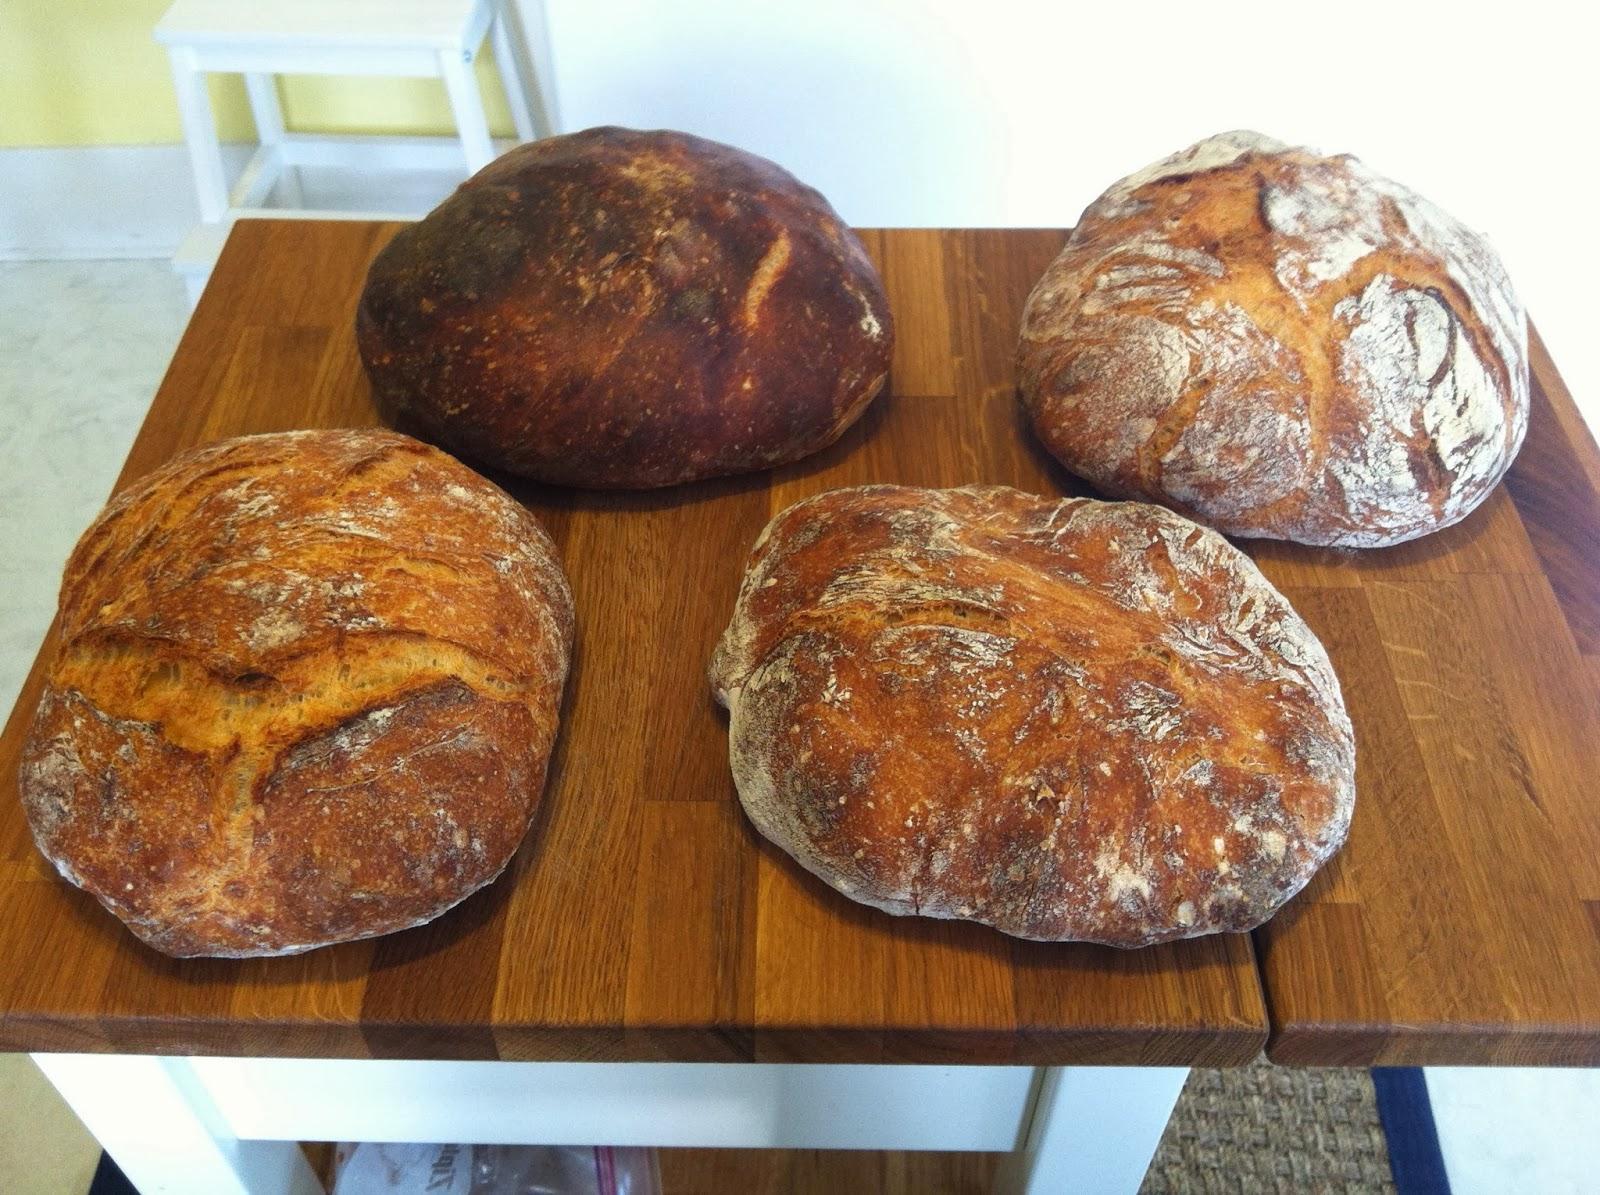 Bread+experiment+3.jpg